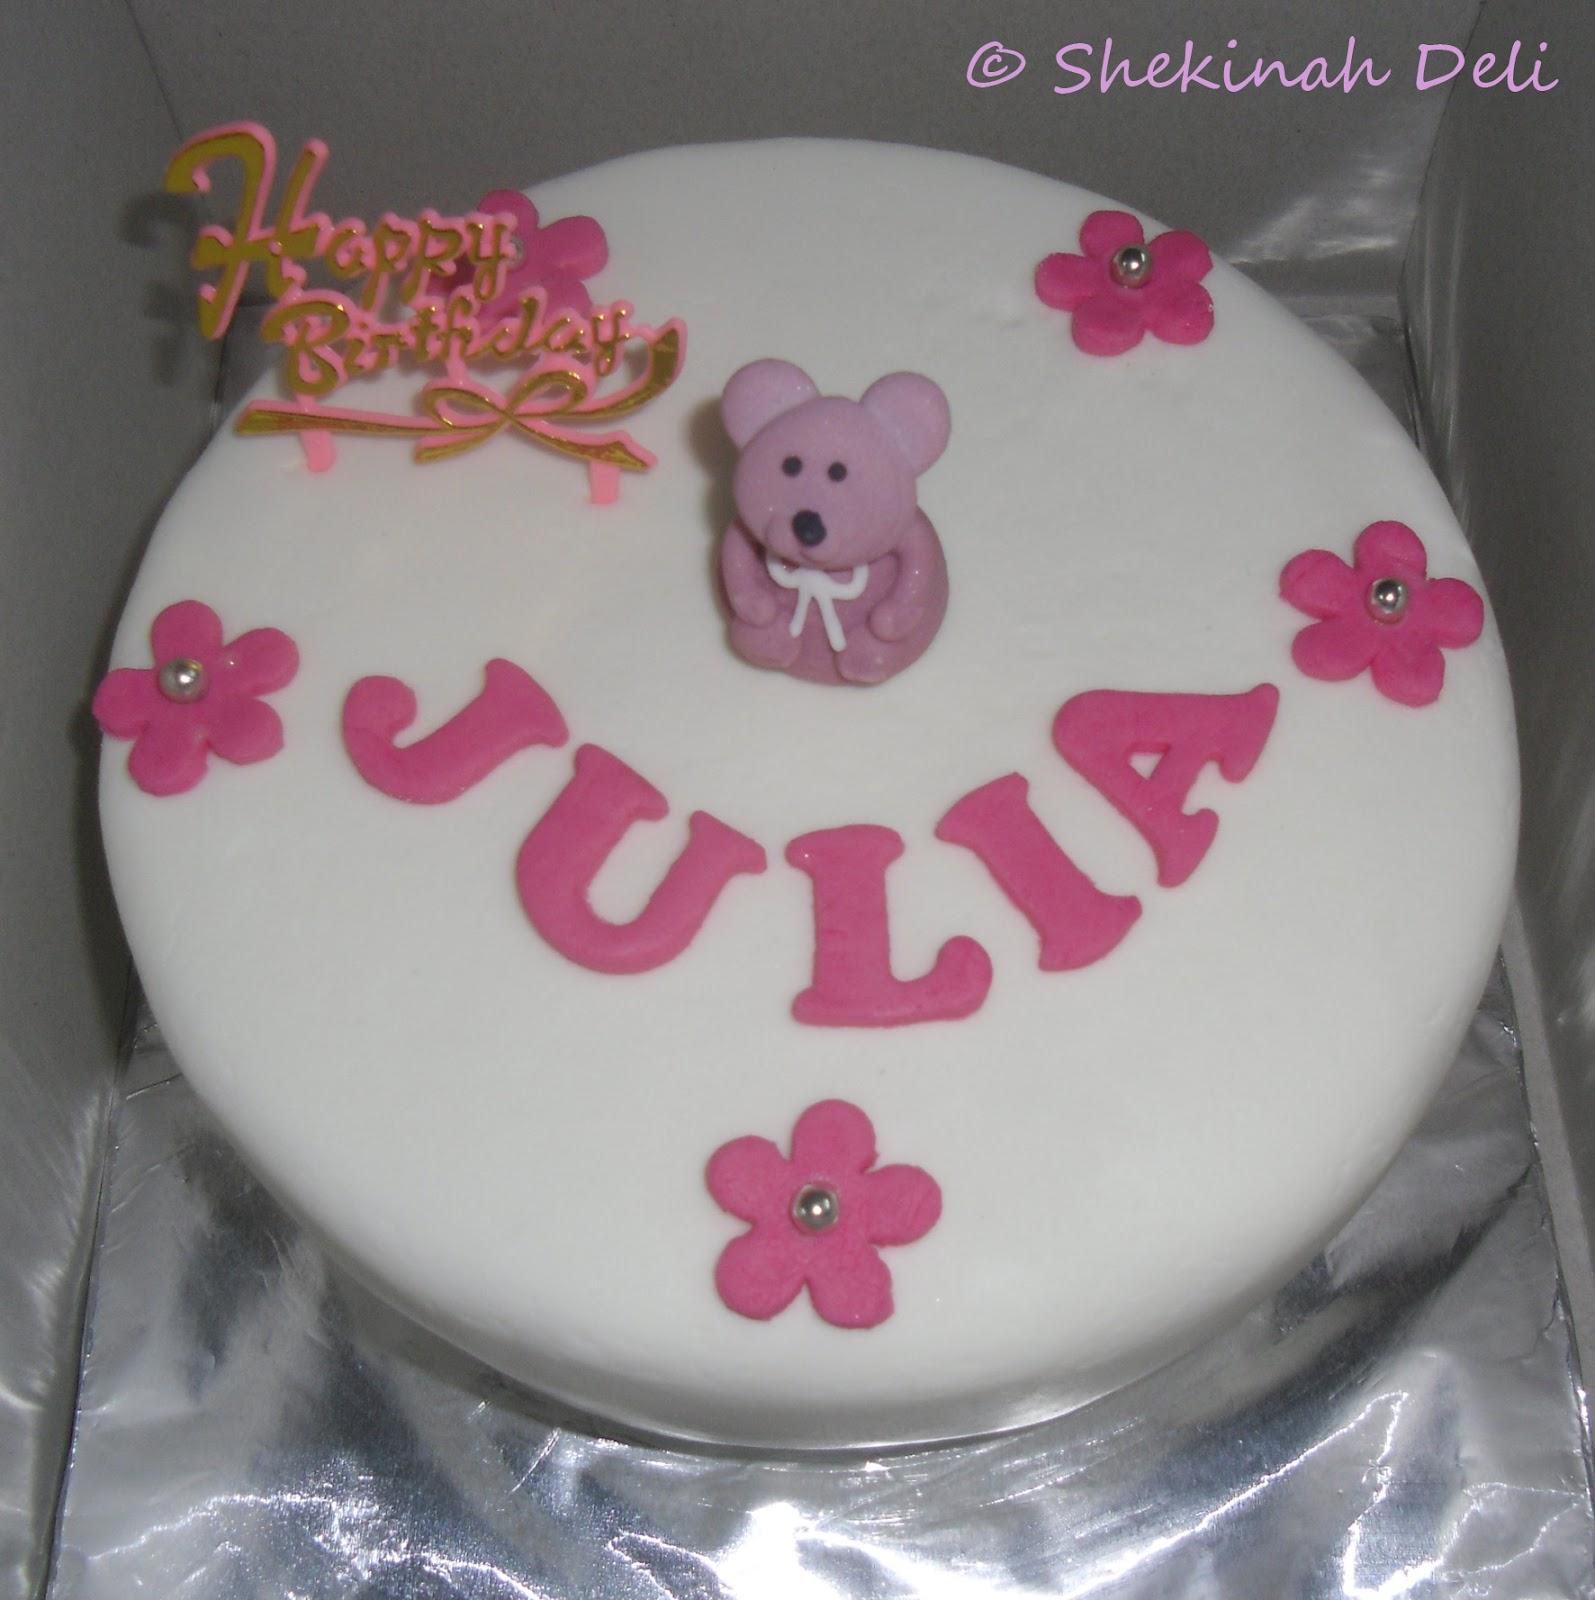 Shekinah Deli Julias Birthday Cakes